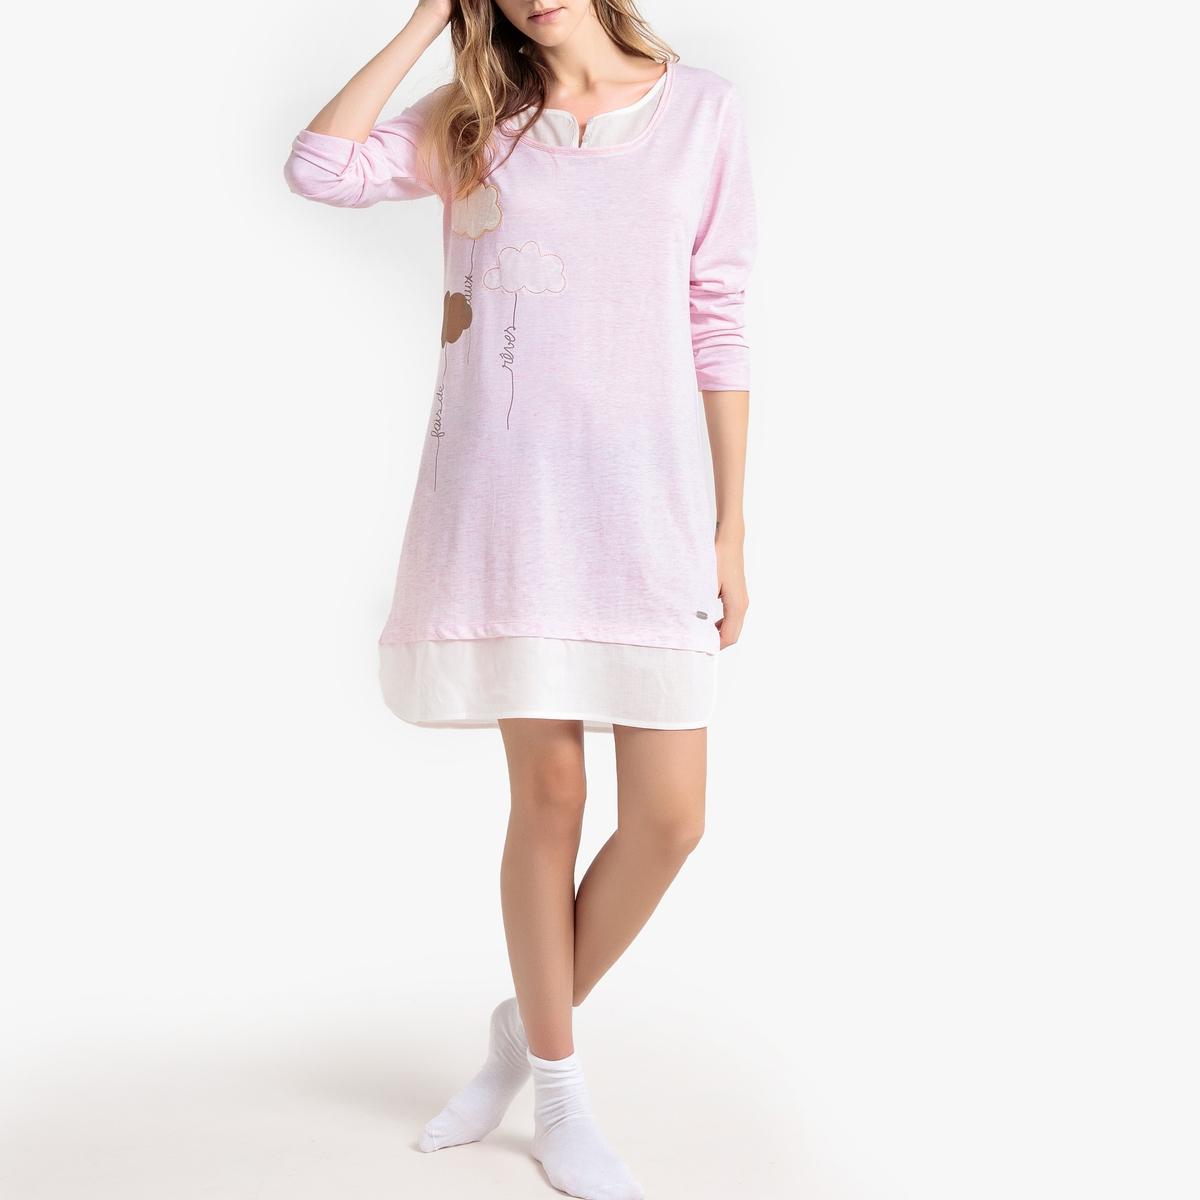 Рубашка La Redoute Ночная из хлопка Intime XL розовый свитшот la redoute la redoute xl розовый